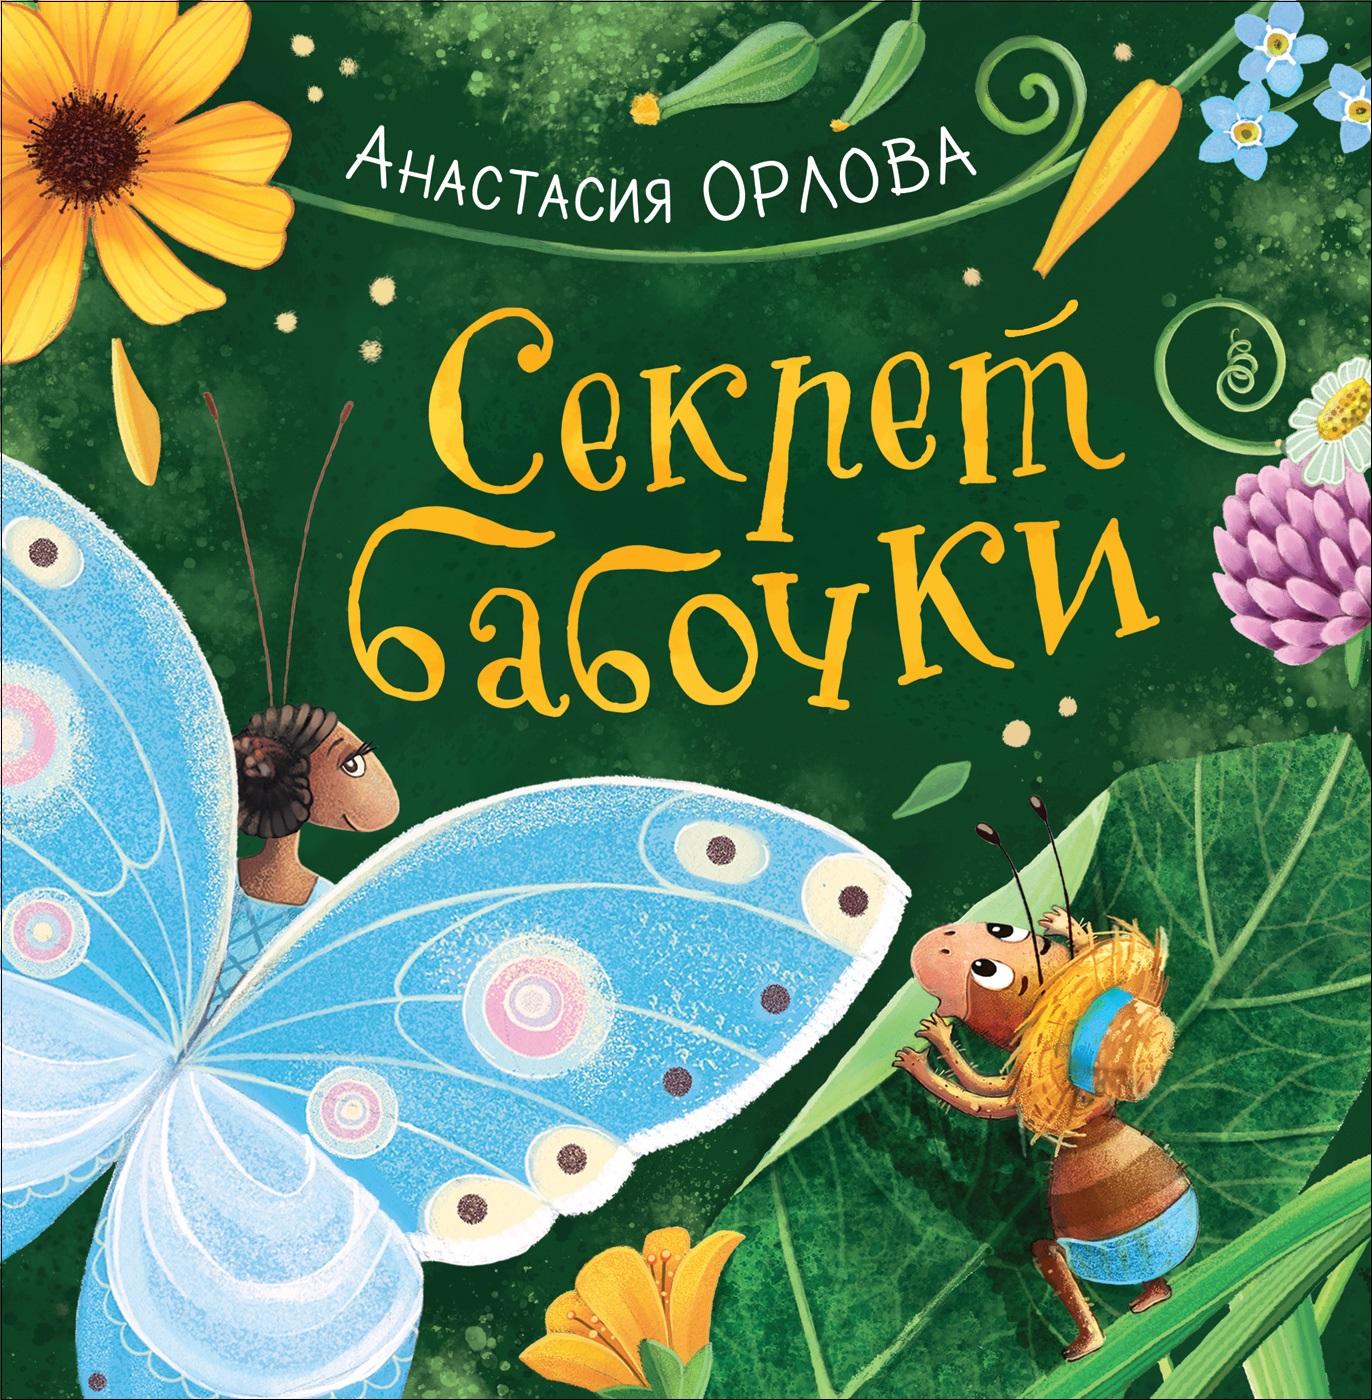 Орлова А. Секрет бабочки (НДК) история бабочки